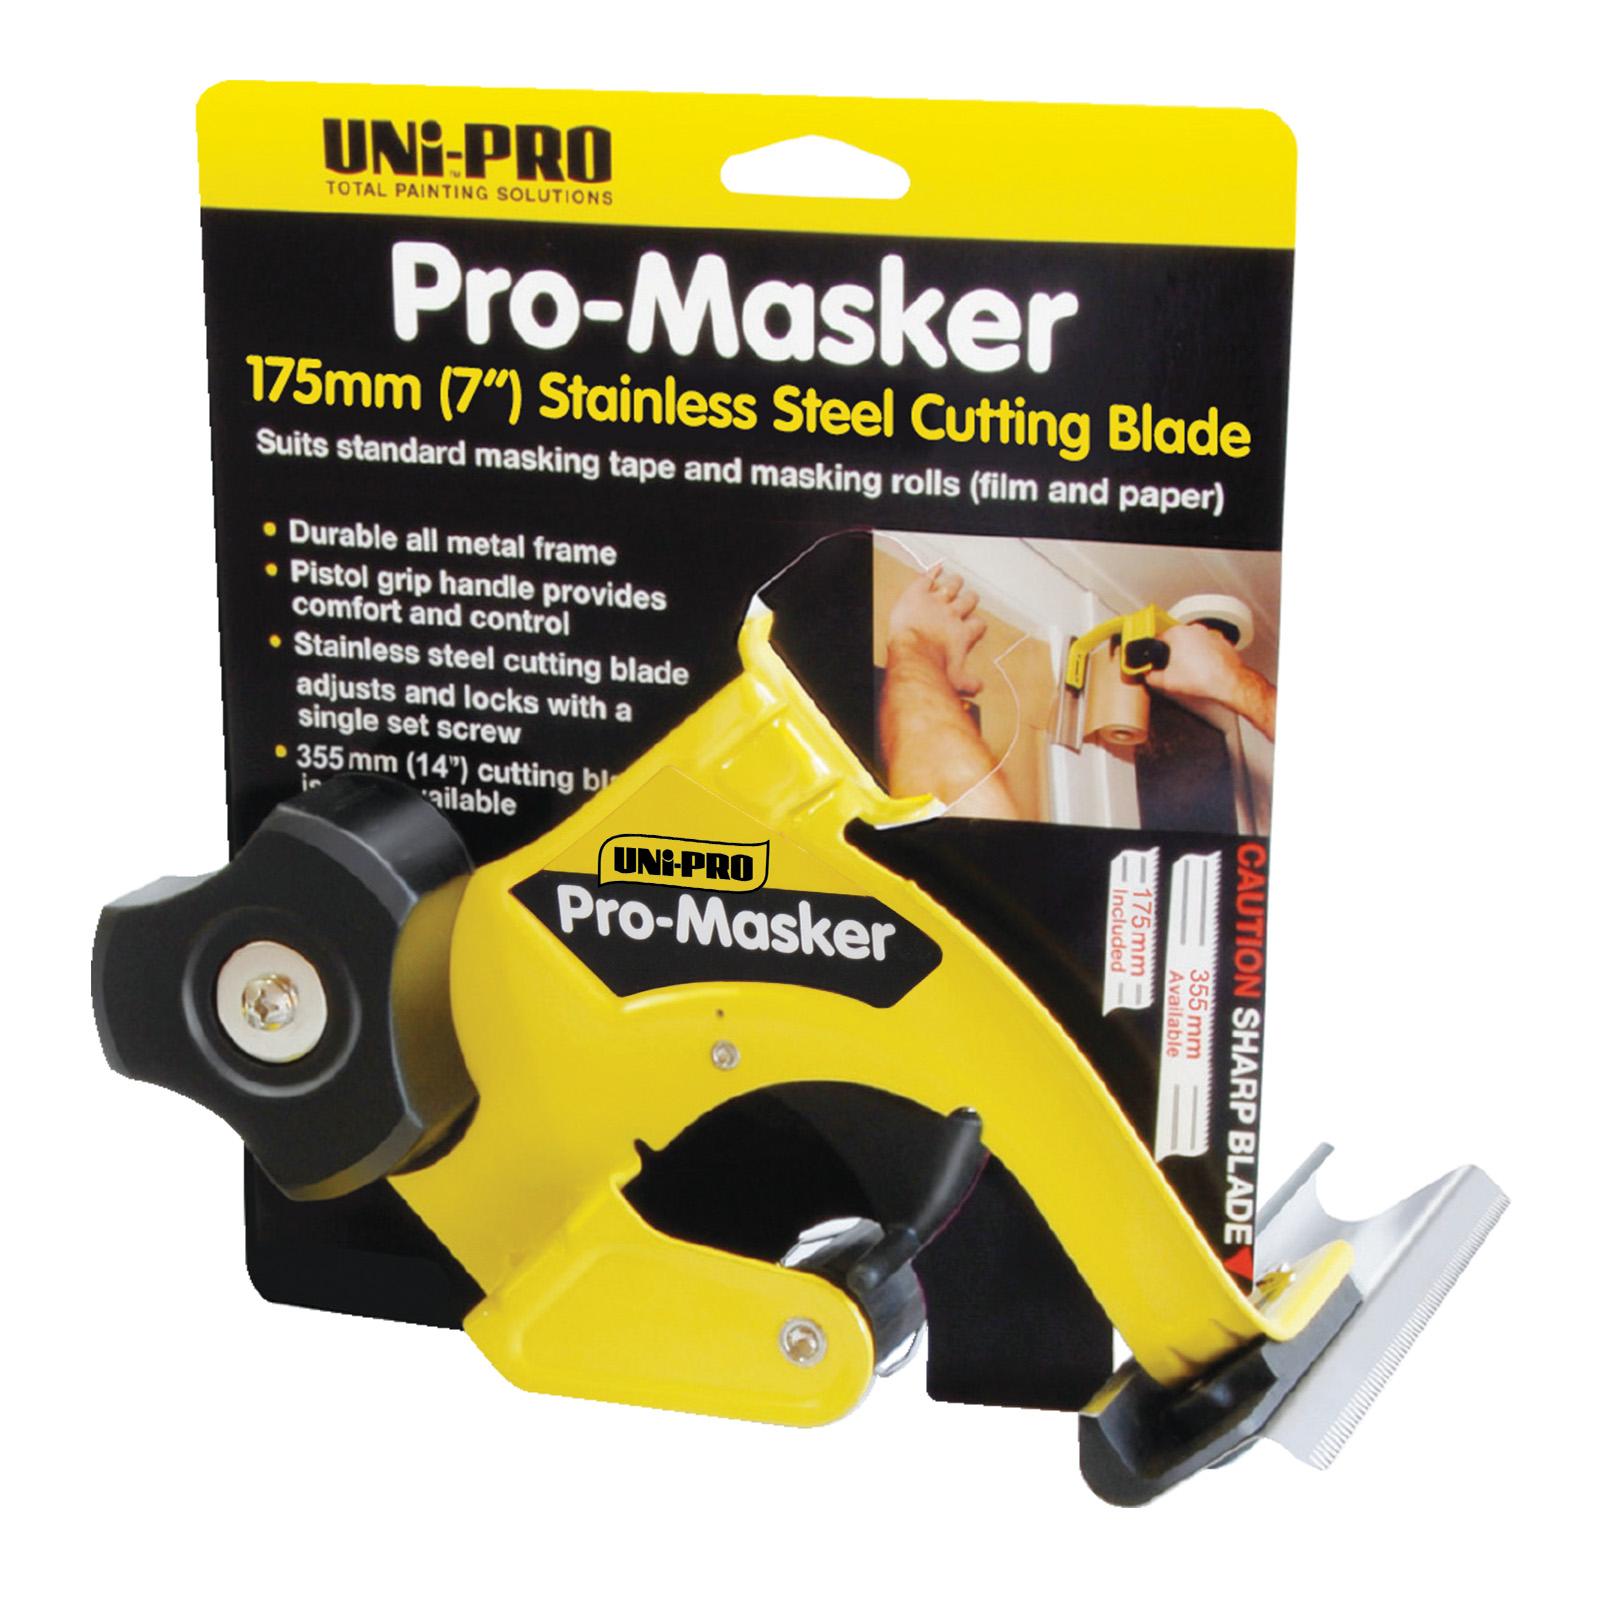 UNi-PRO Pro-Masker Pre-Folded Film Range